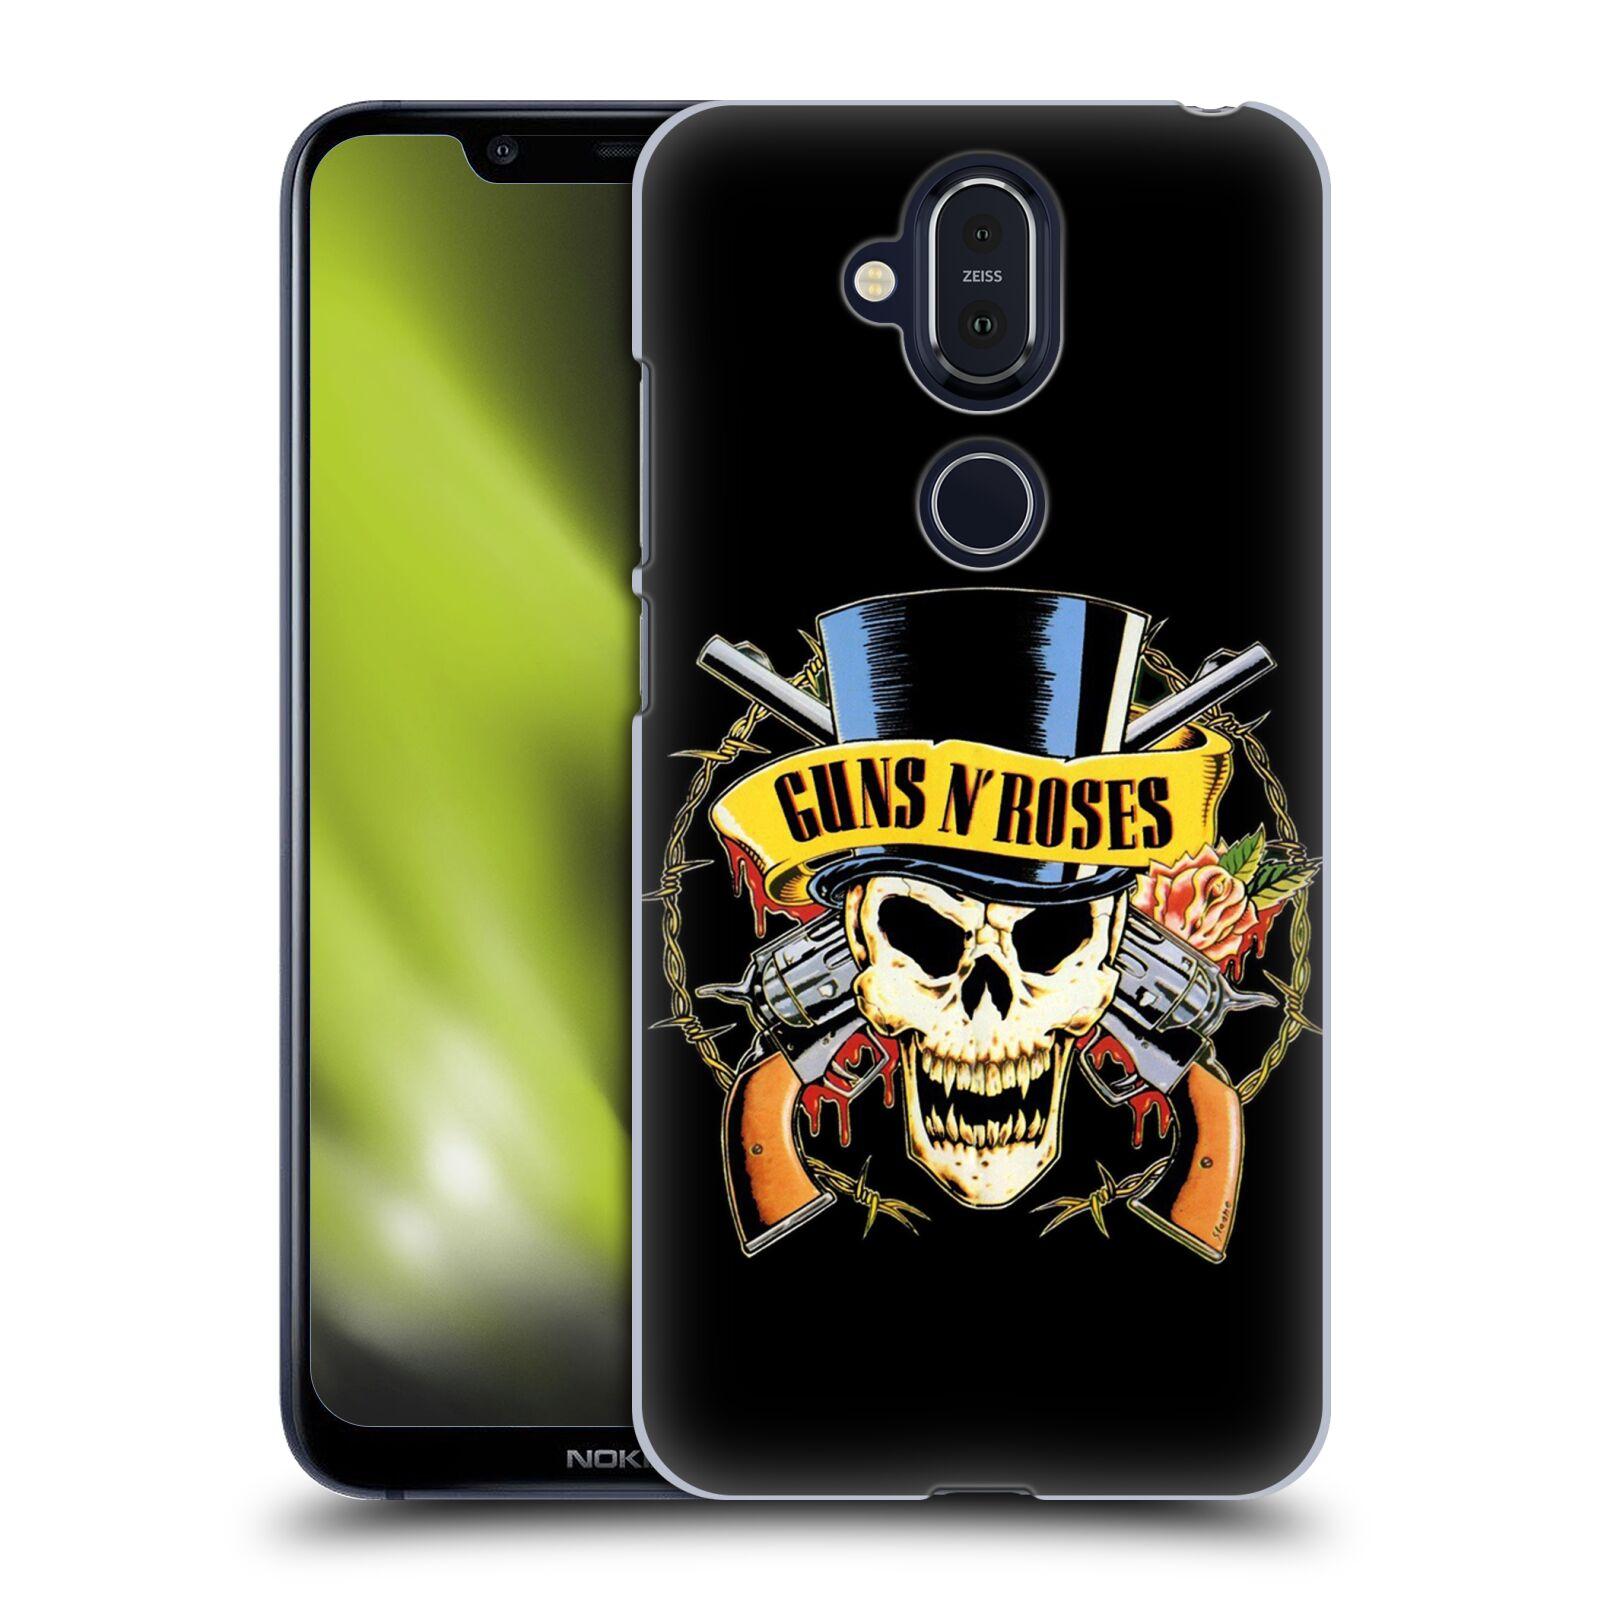 Plastové pouzdro na mobil Nokia 8.1 - Head Case - Guns N' Roses - Lebka